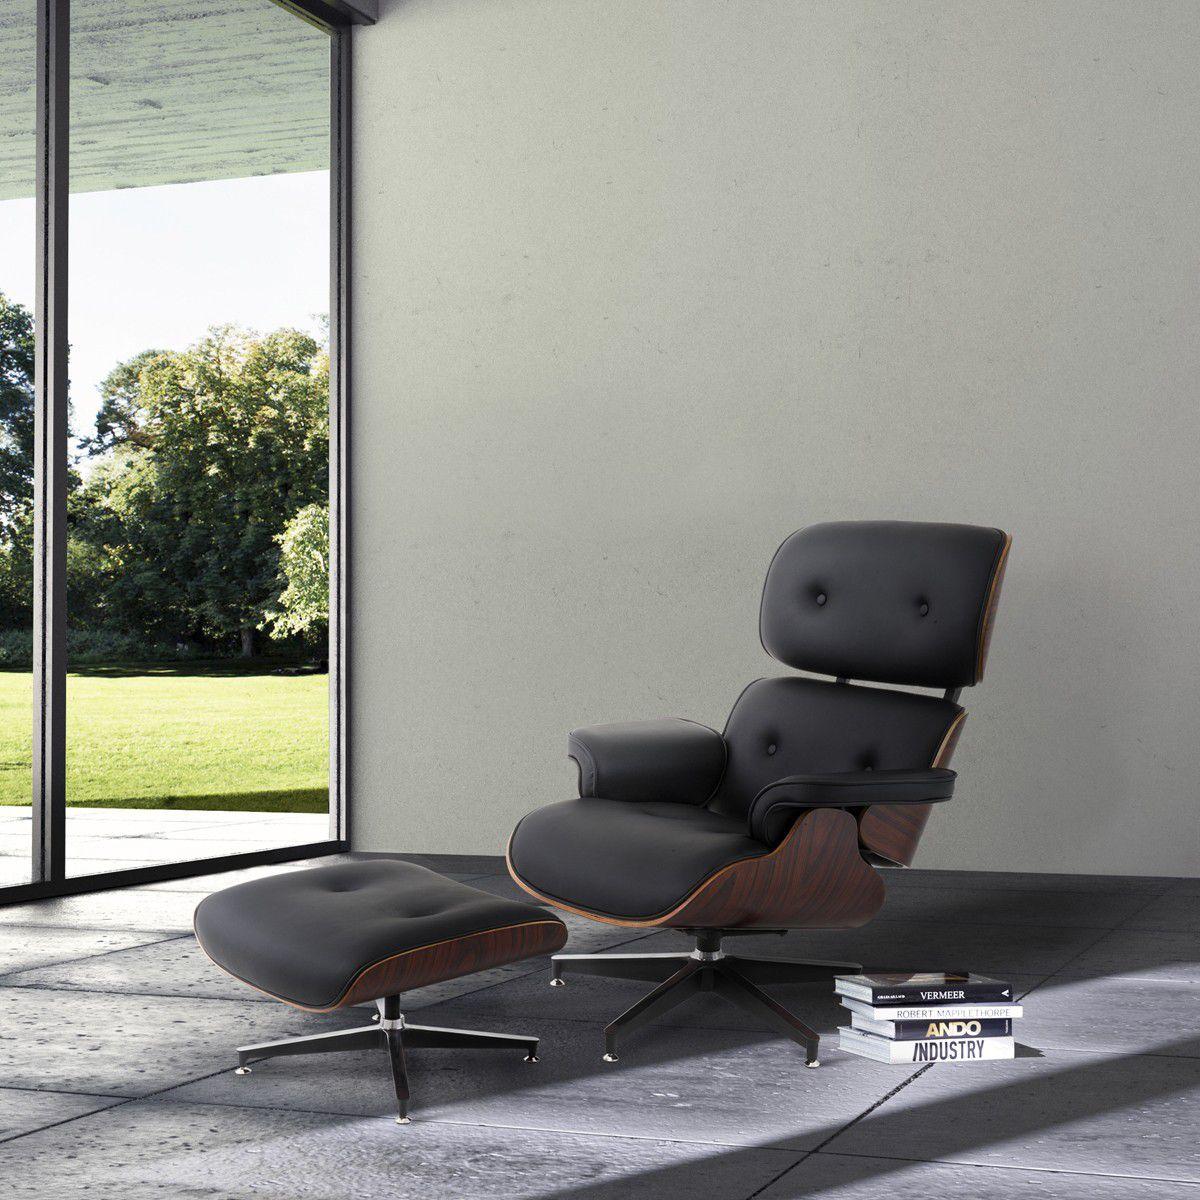 Poltrona com Puff Or Design Charles Eames Preto